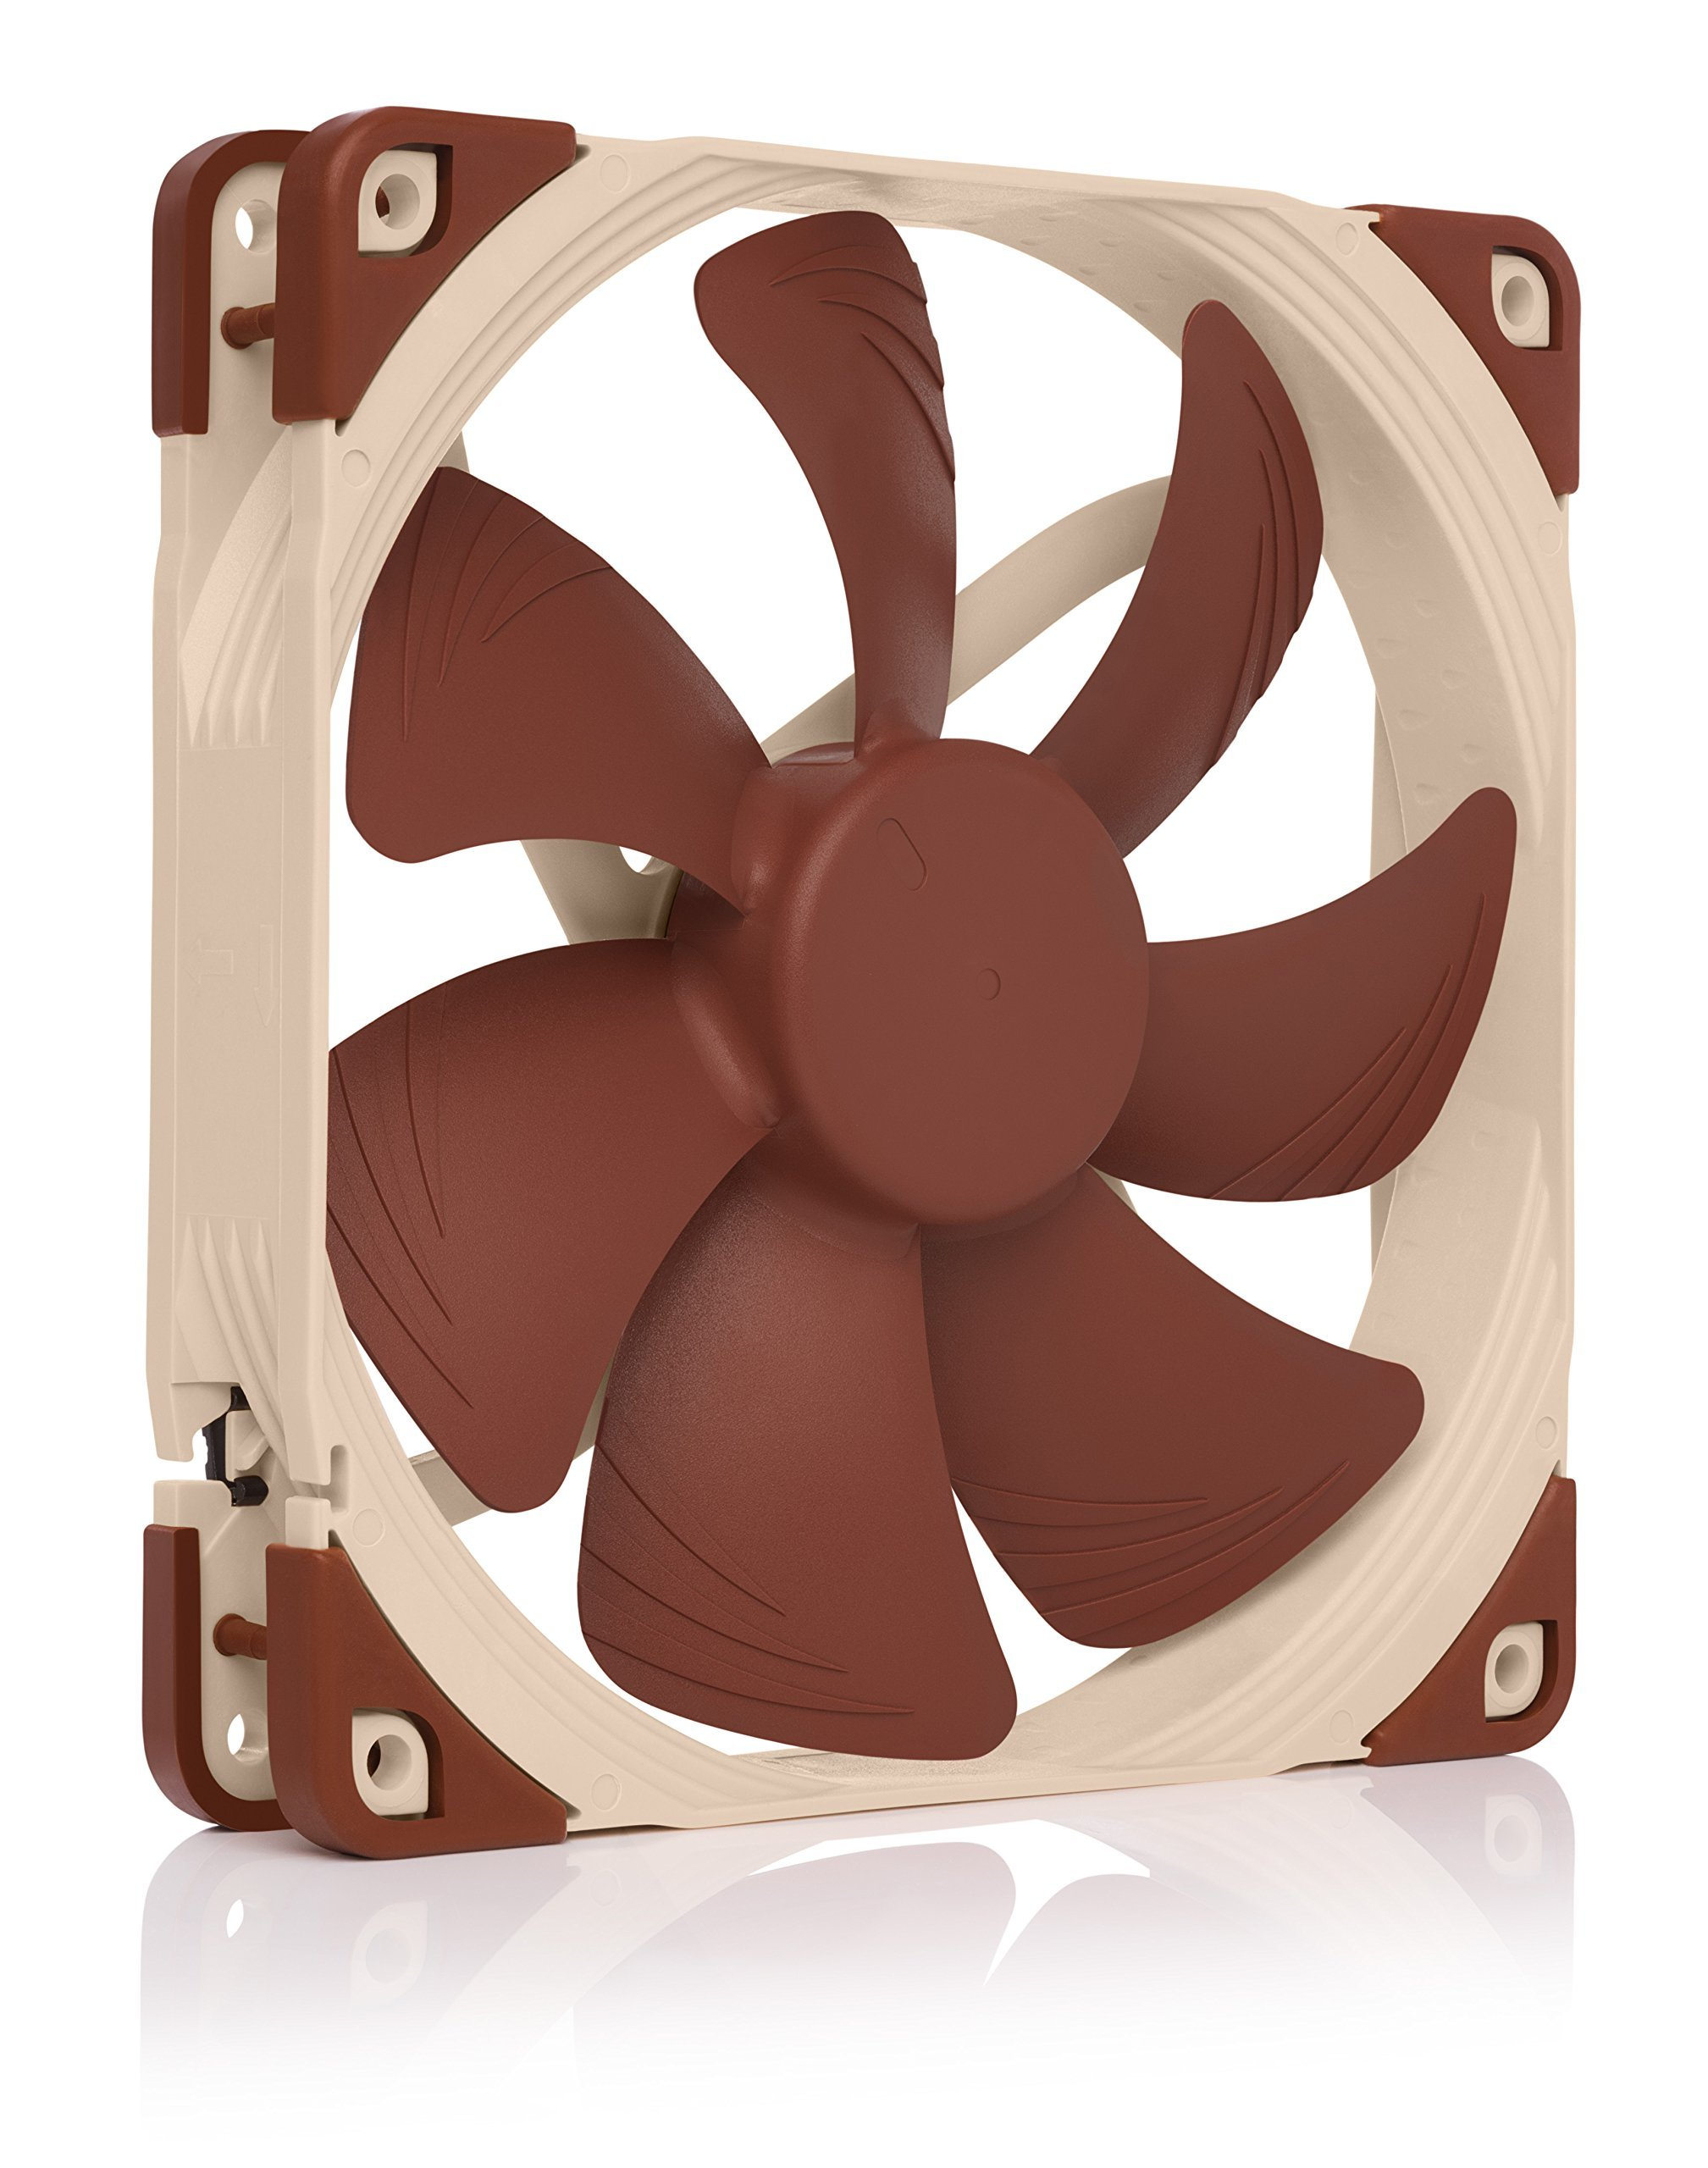 3-Pin Noctua NF-A8 FLX Premium Quiet Fan 80mm, Brown